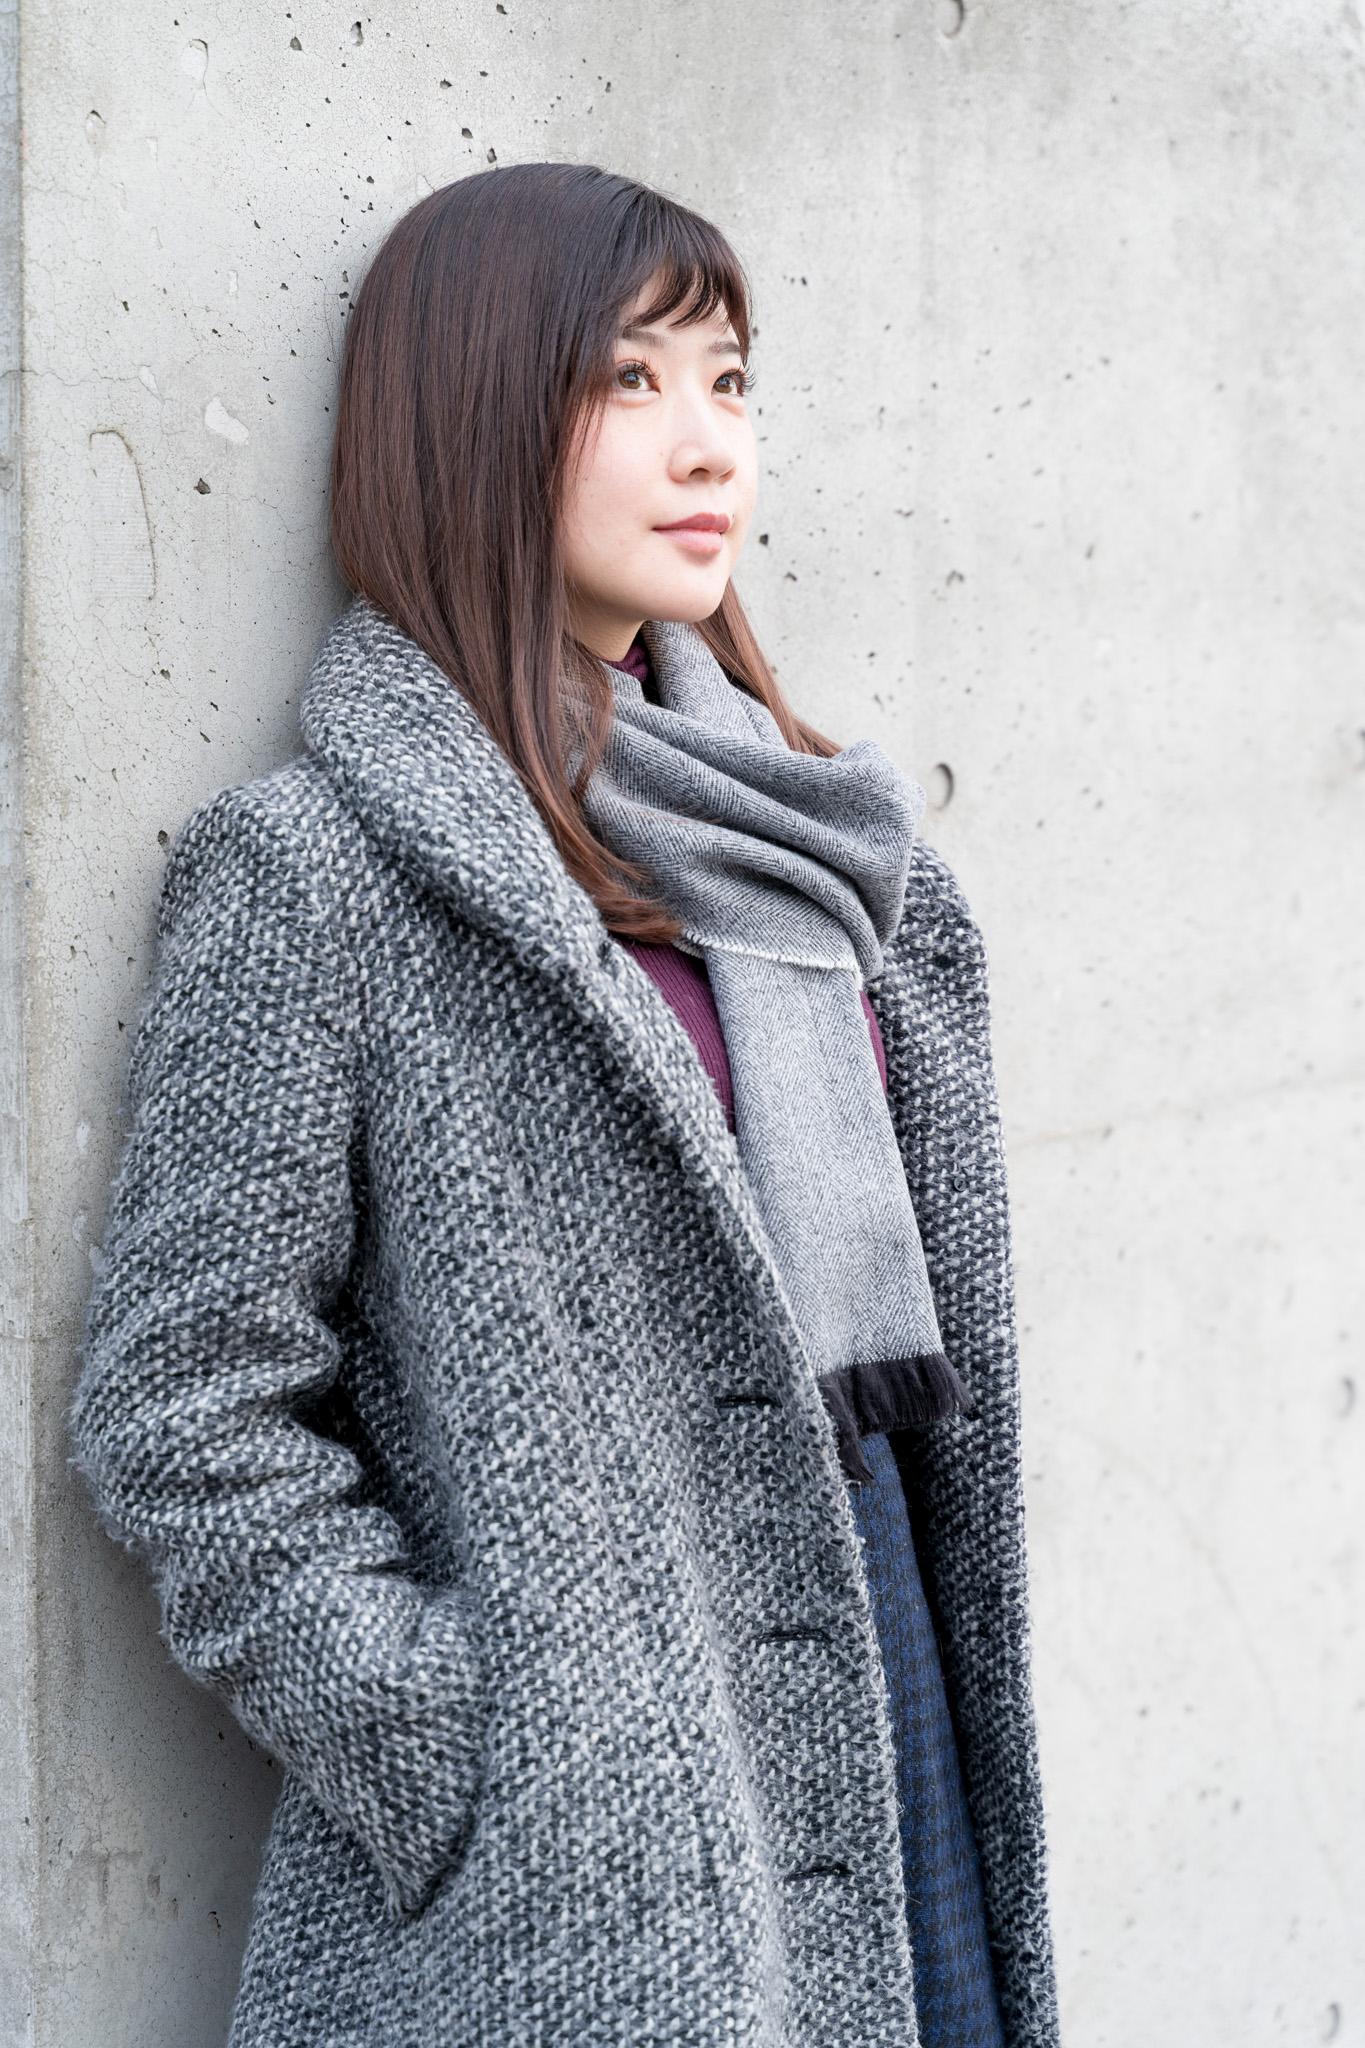 f:id:daito-a110:20200131005436j:plain